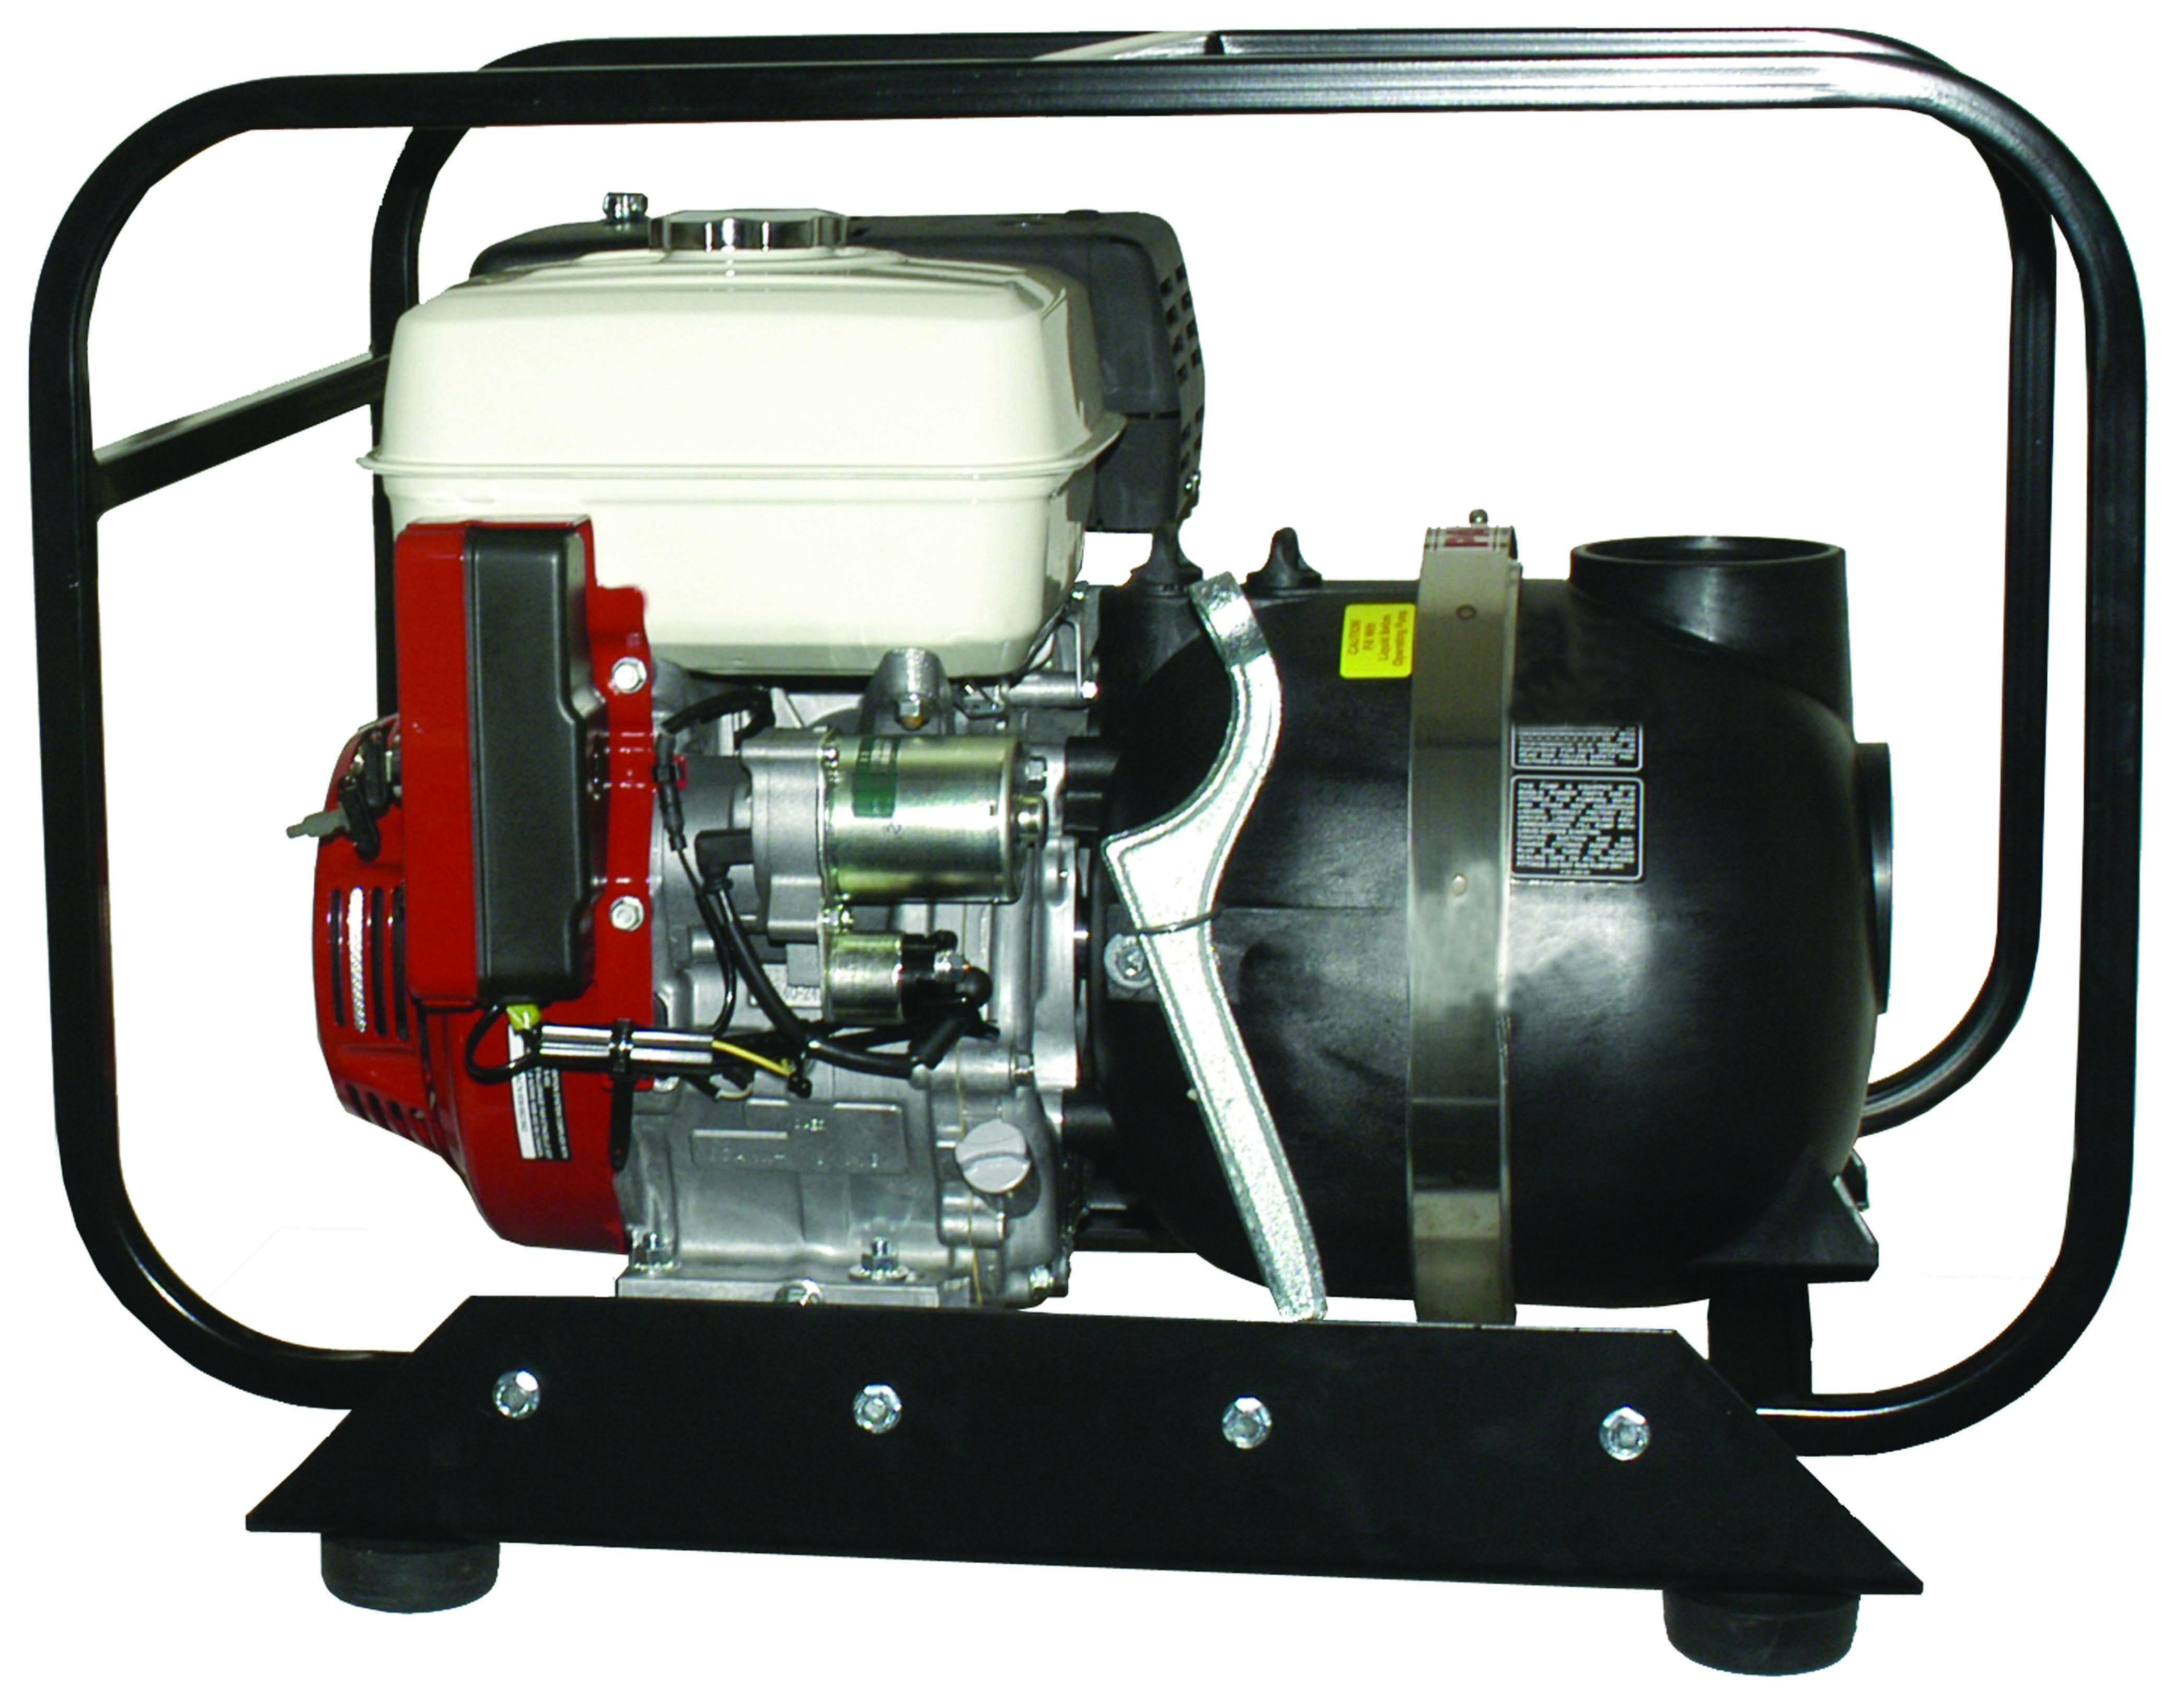 Pacer Self-Priming Solids Handling Centrifugal Gasoline, Water Pump